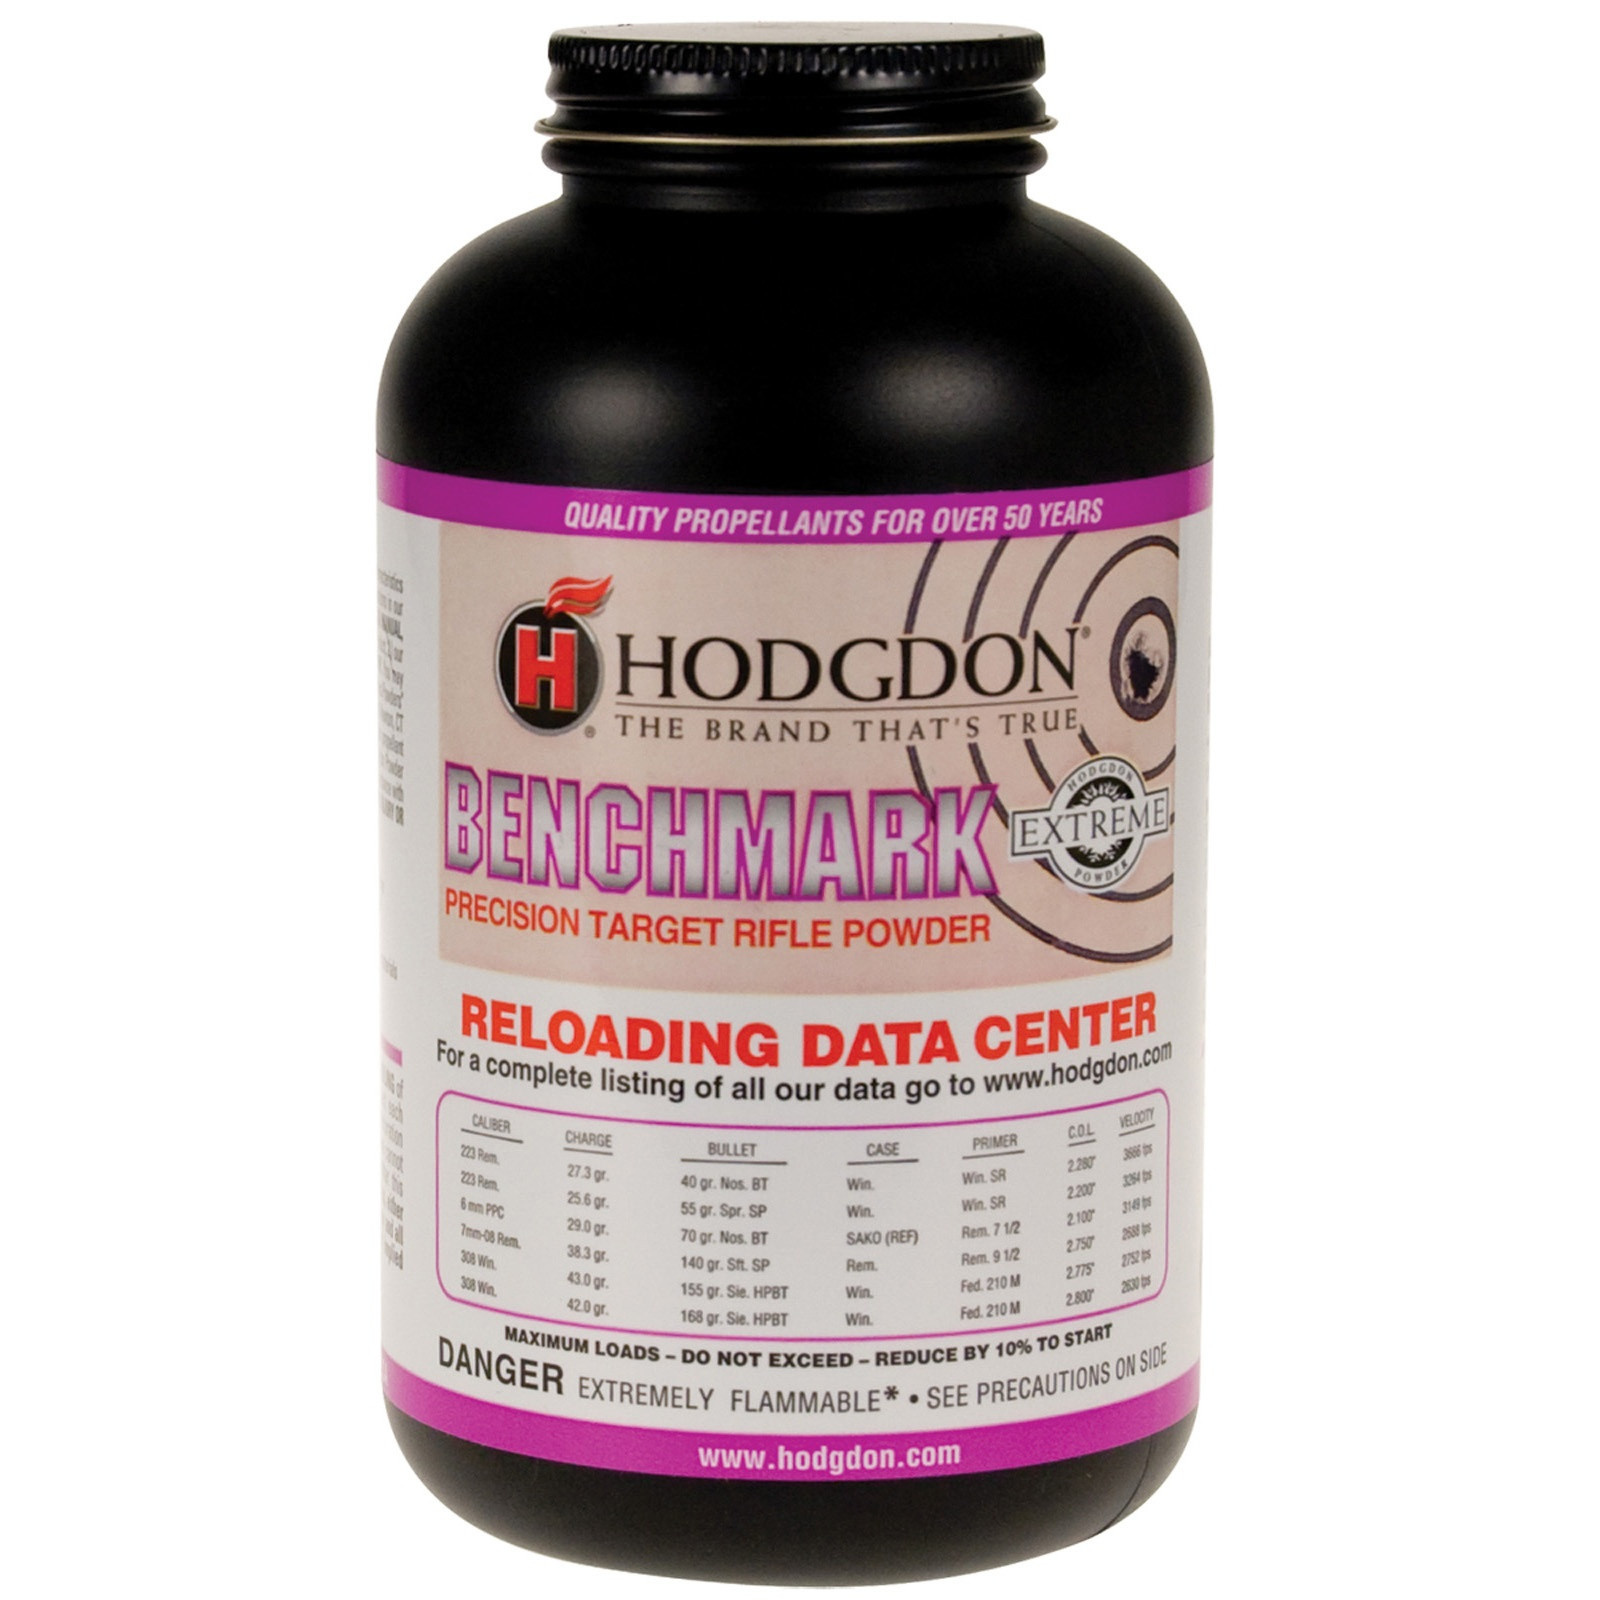 Hodgdon Benchmark Reloading Powder 1lb